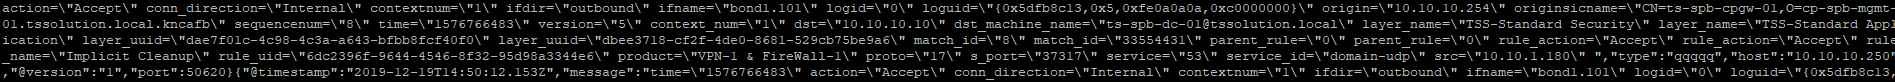 2. Elastic stack: анализ security логов. Logstash - 3